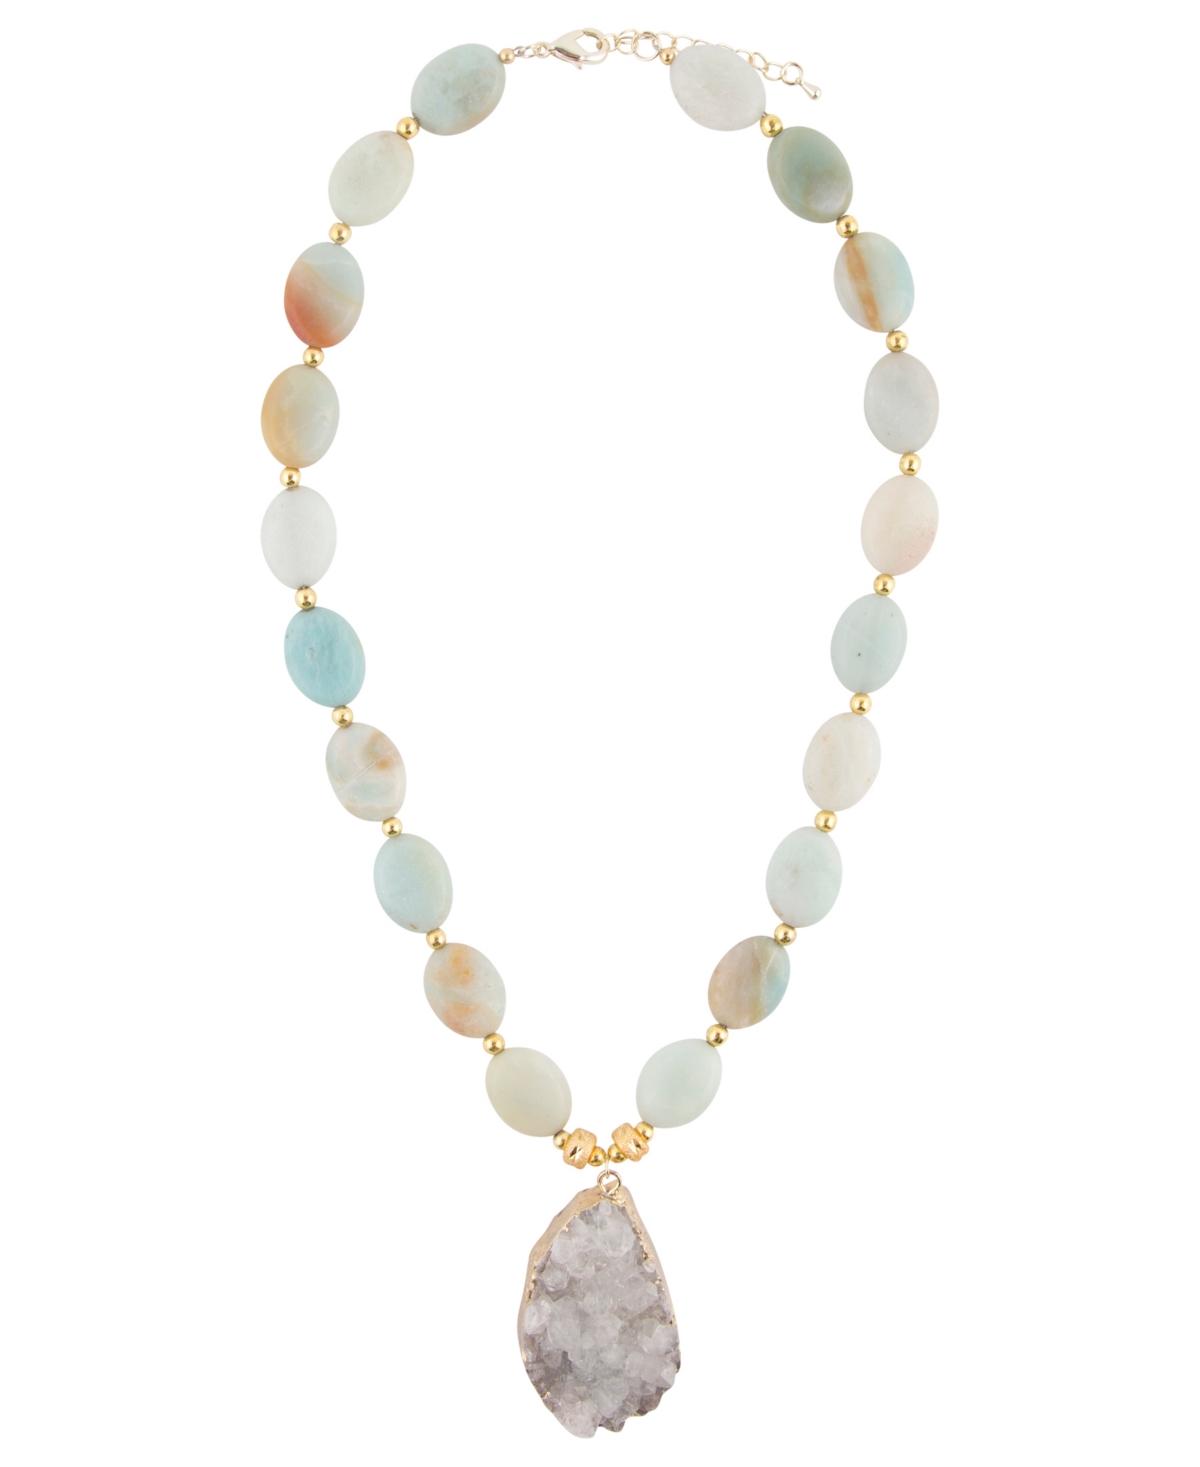 Barse Women's Renew Genuine Stone Pendant Necklace